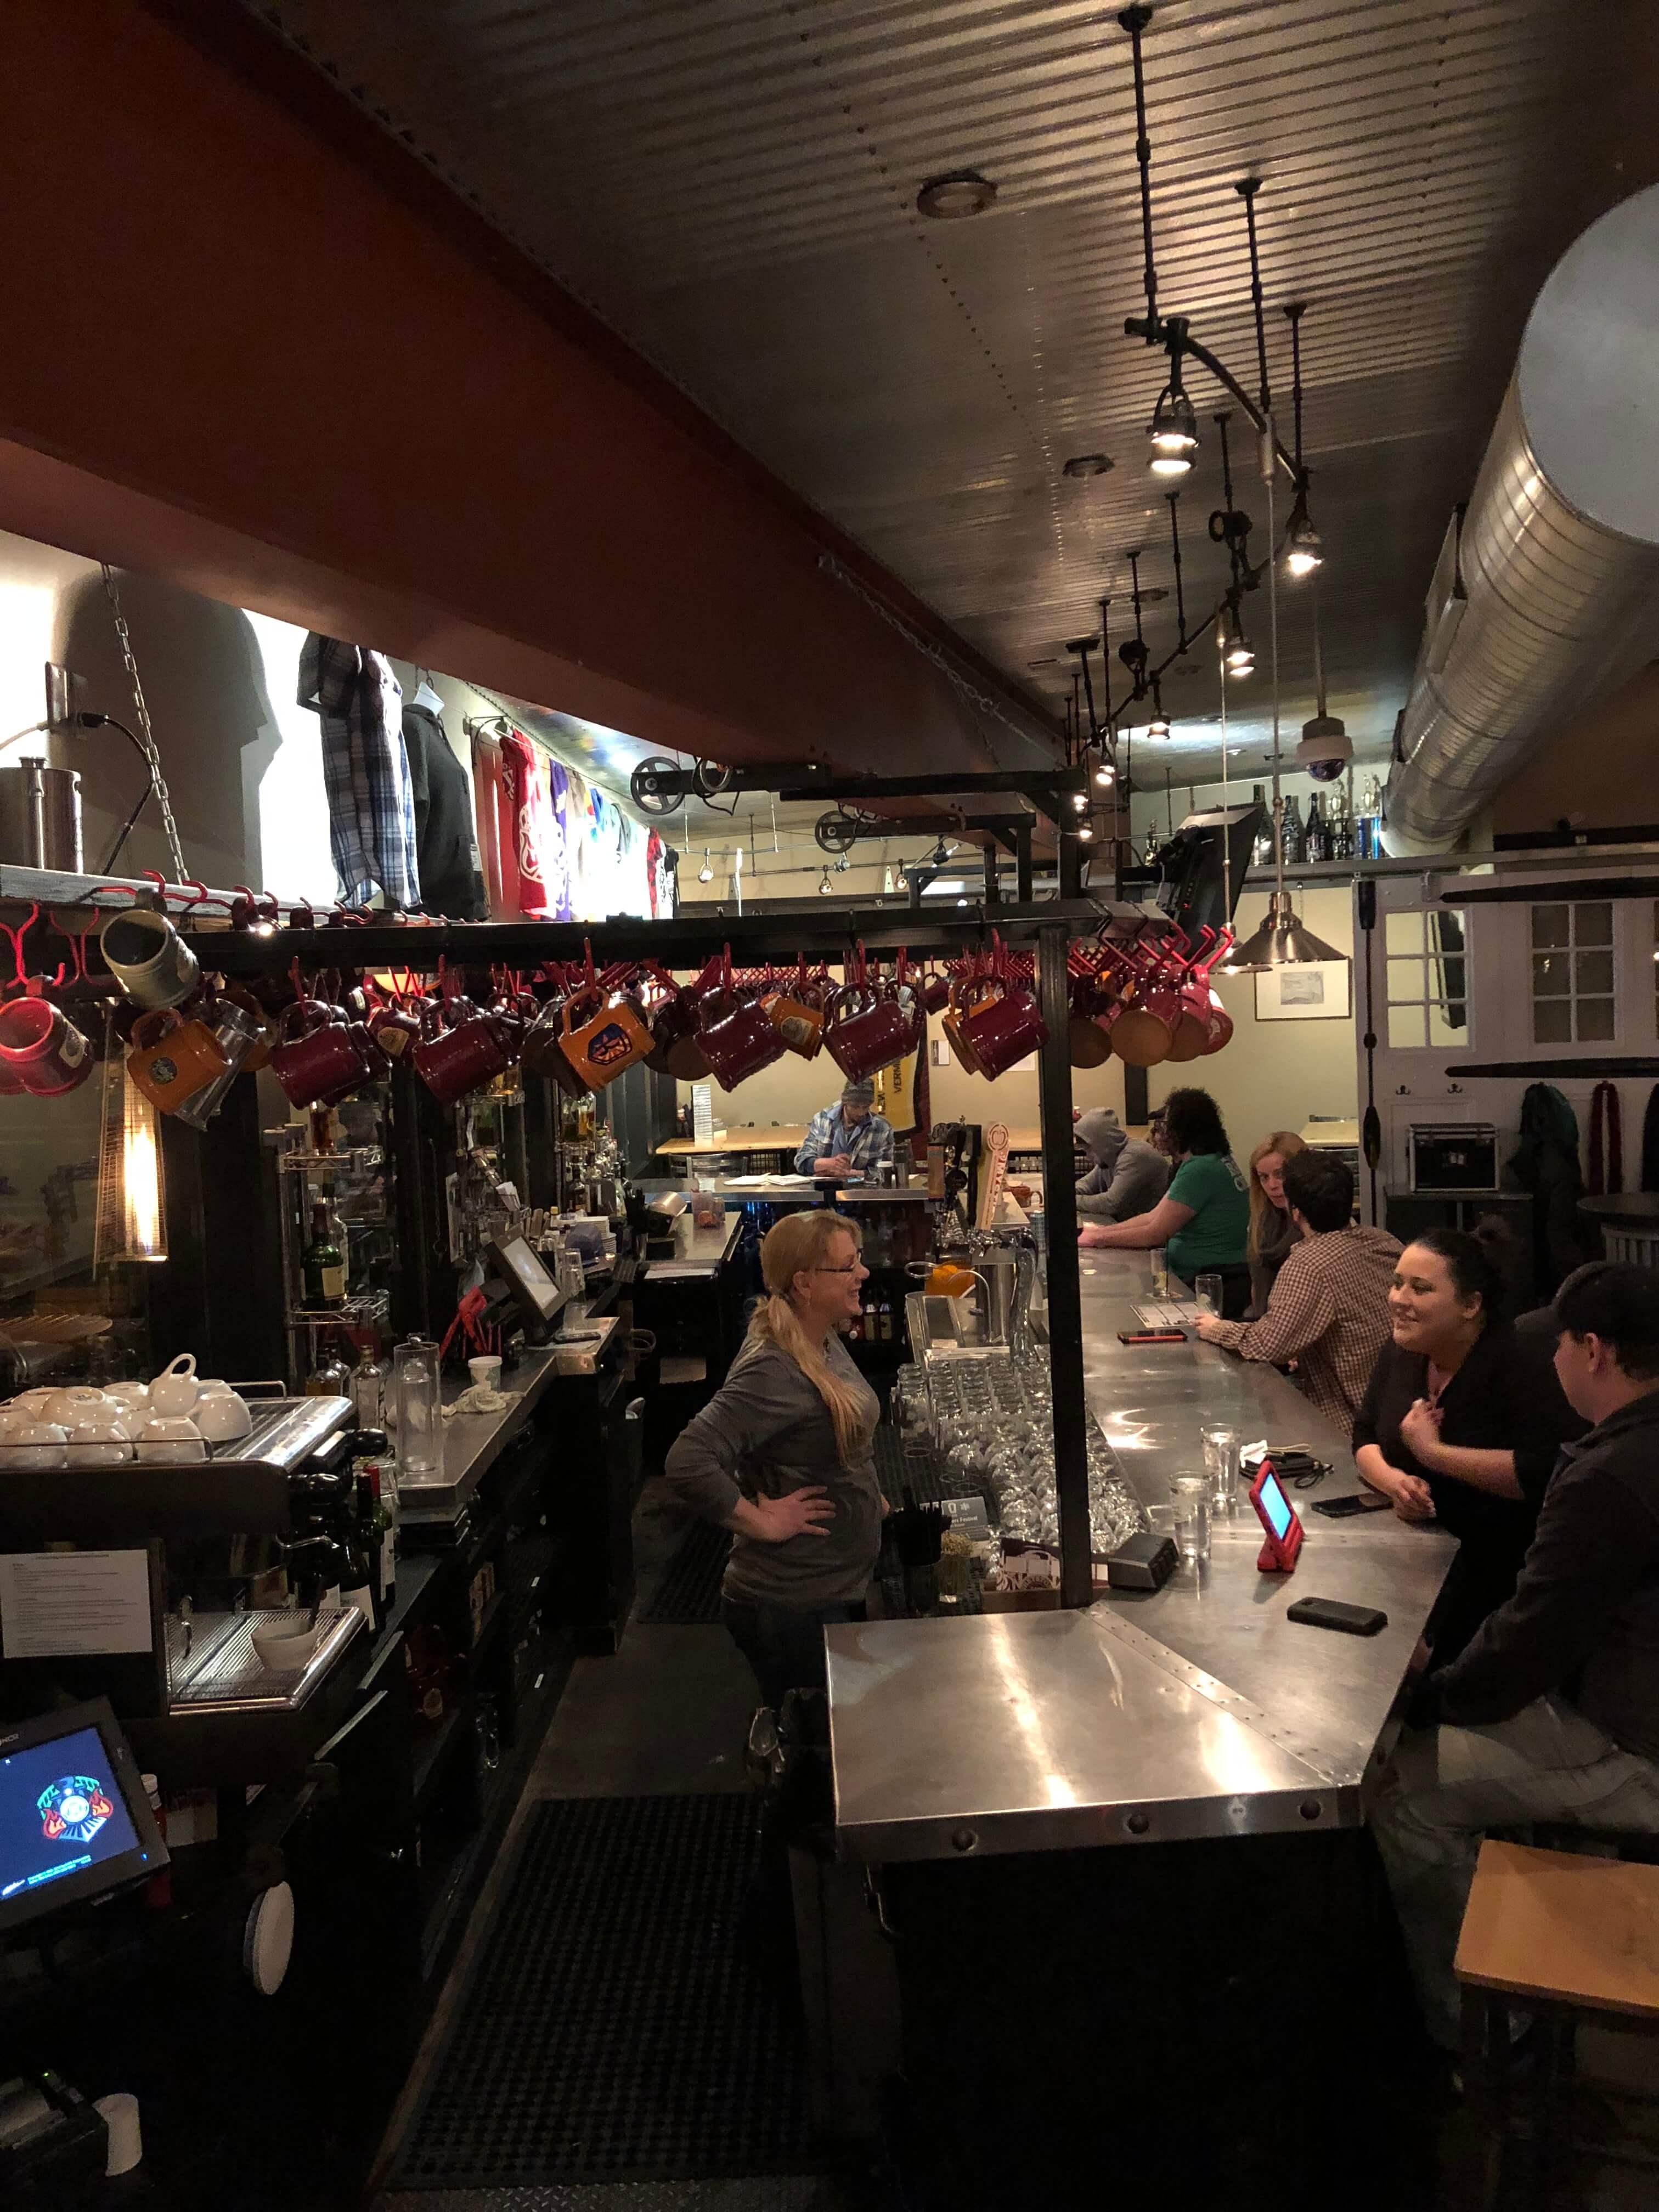 Whetstone Station bar